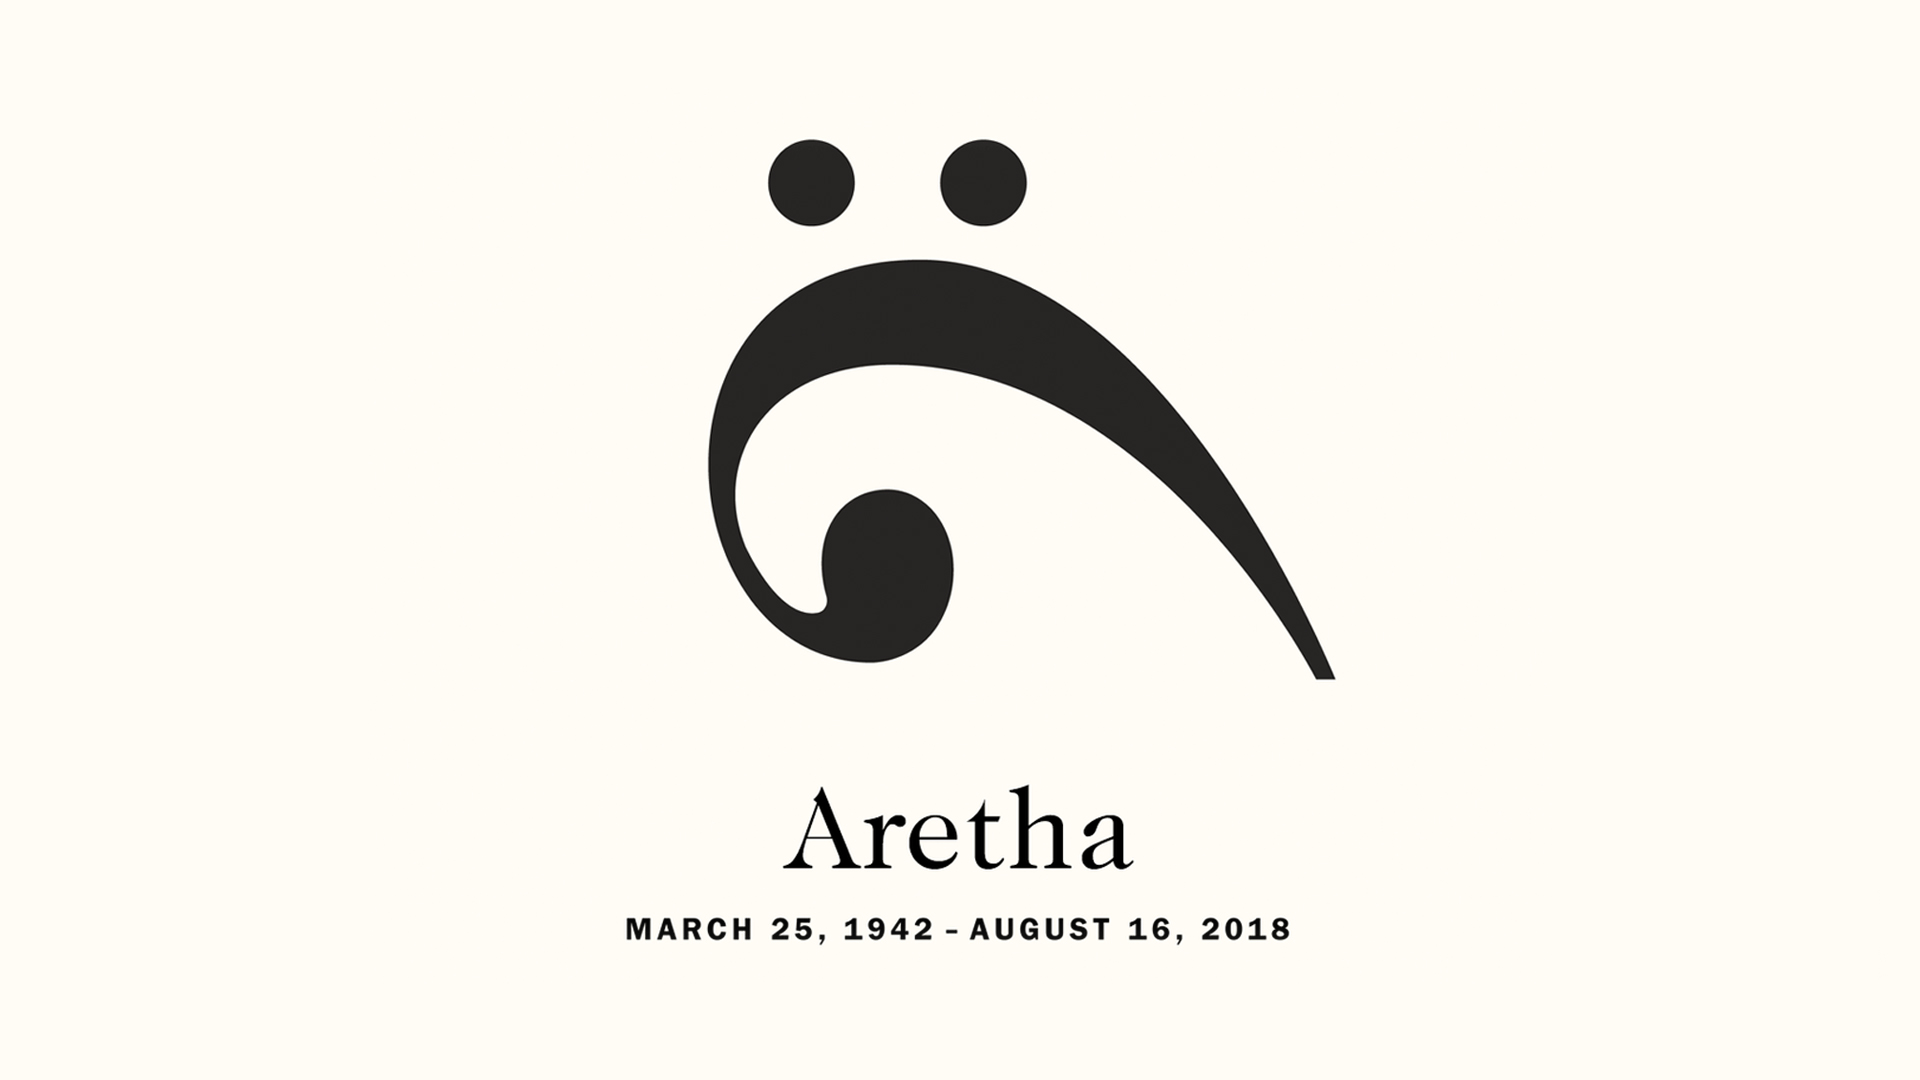 Thank you, Aretha.